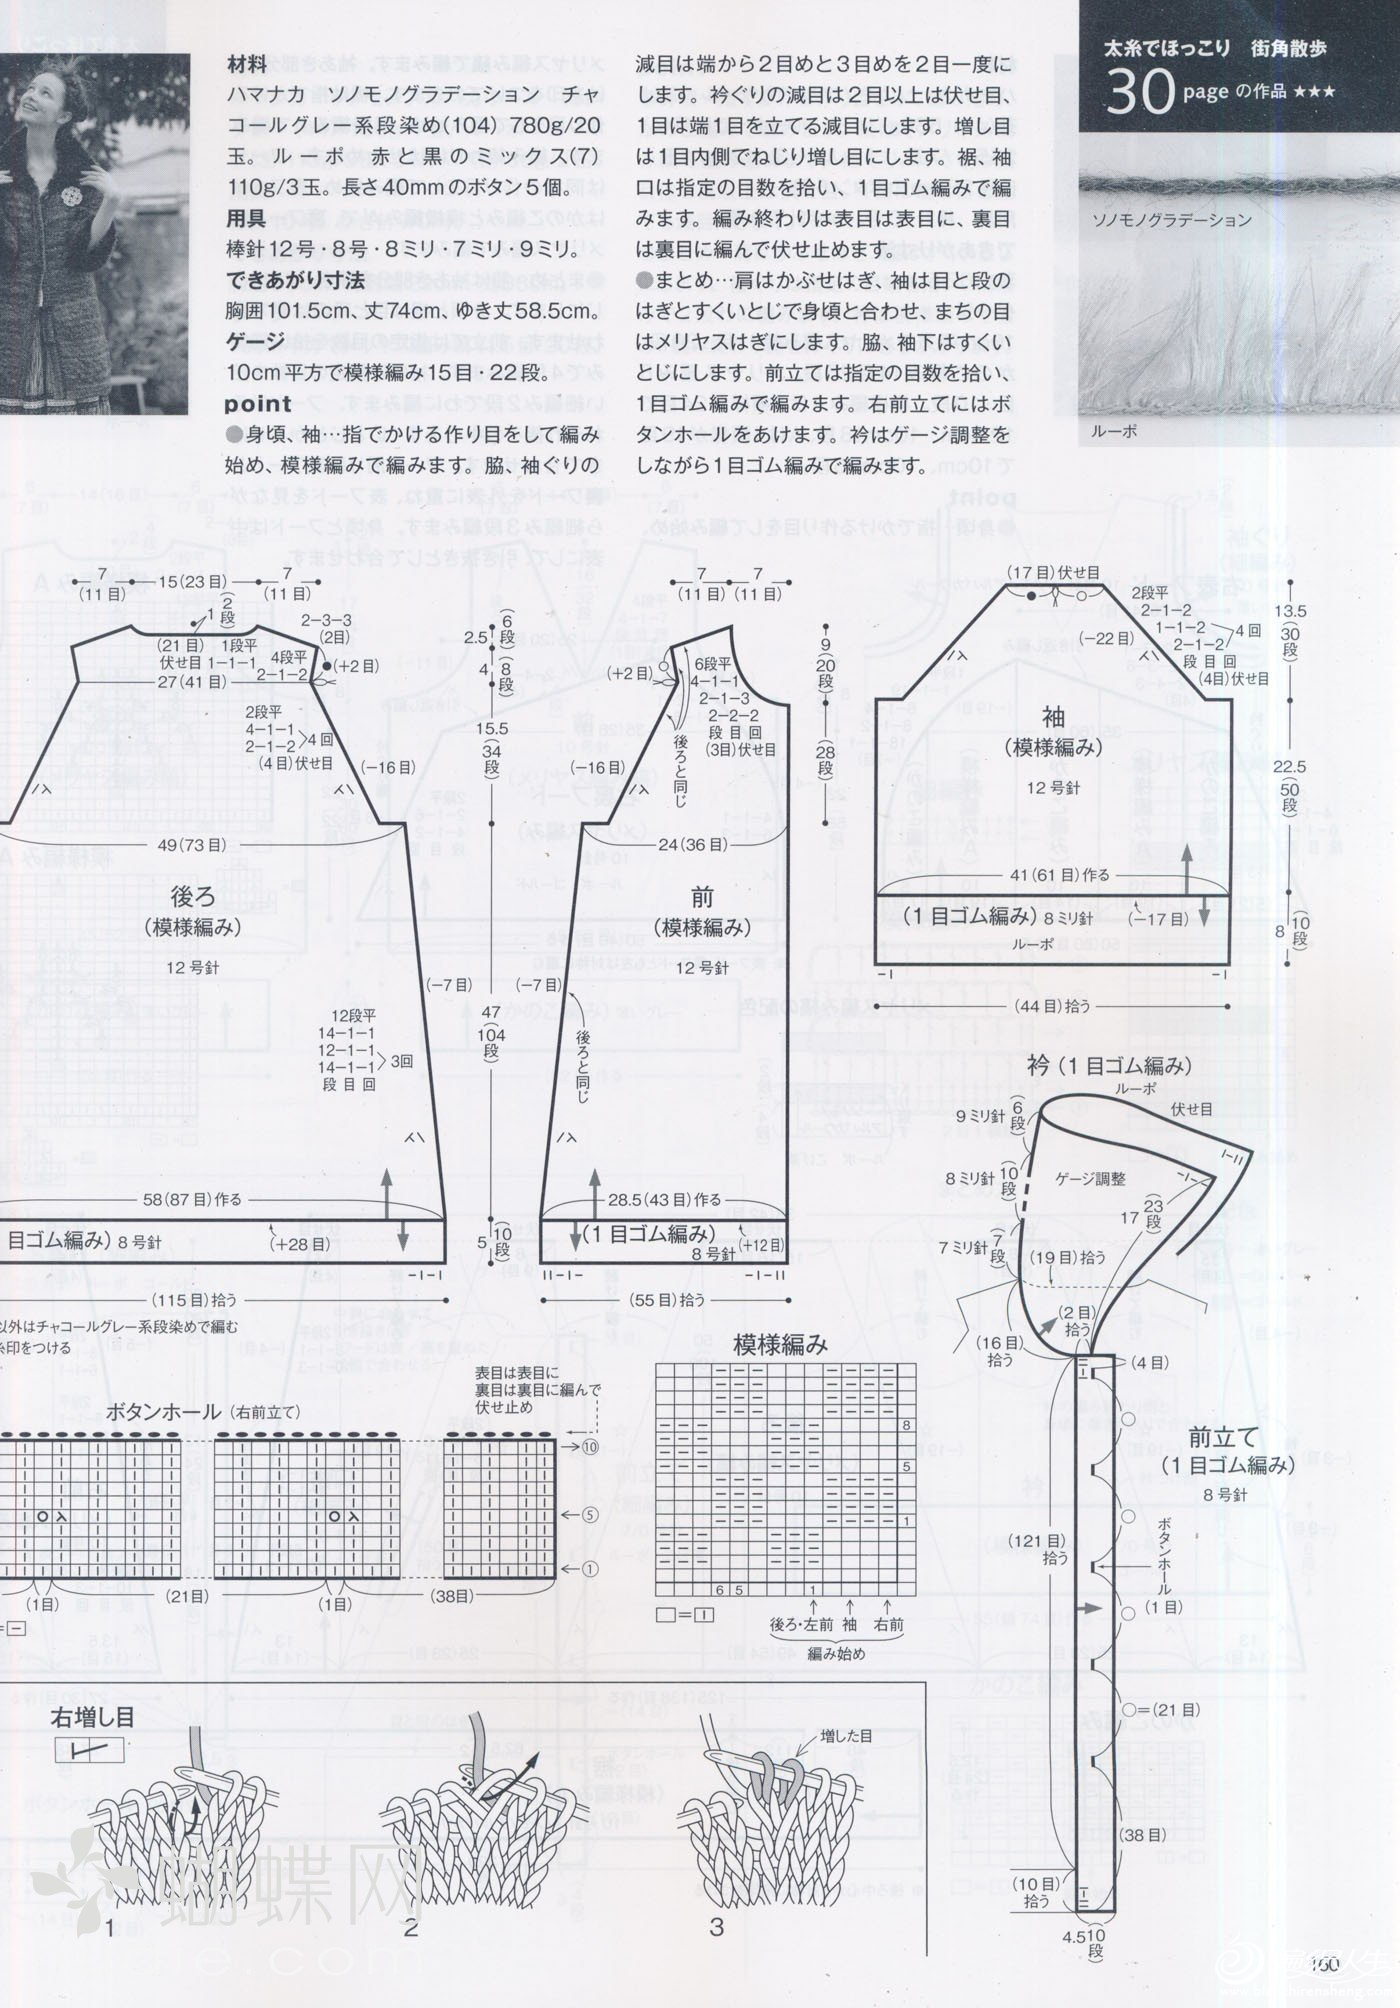 淘宝旺旺 song2915555 (159).jpg